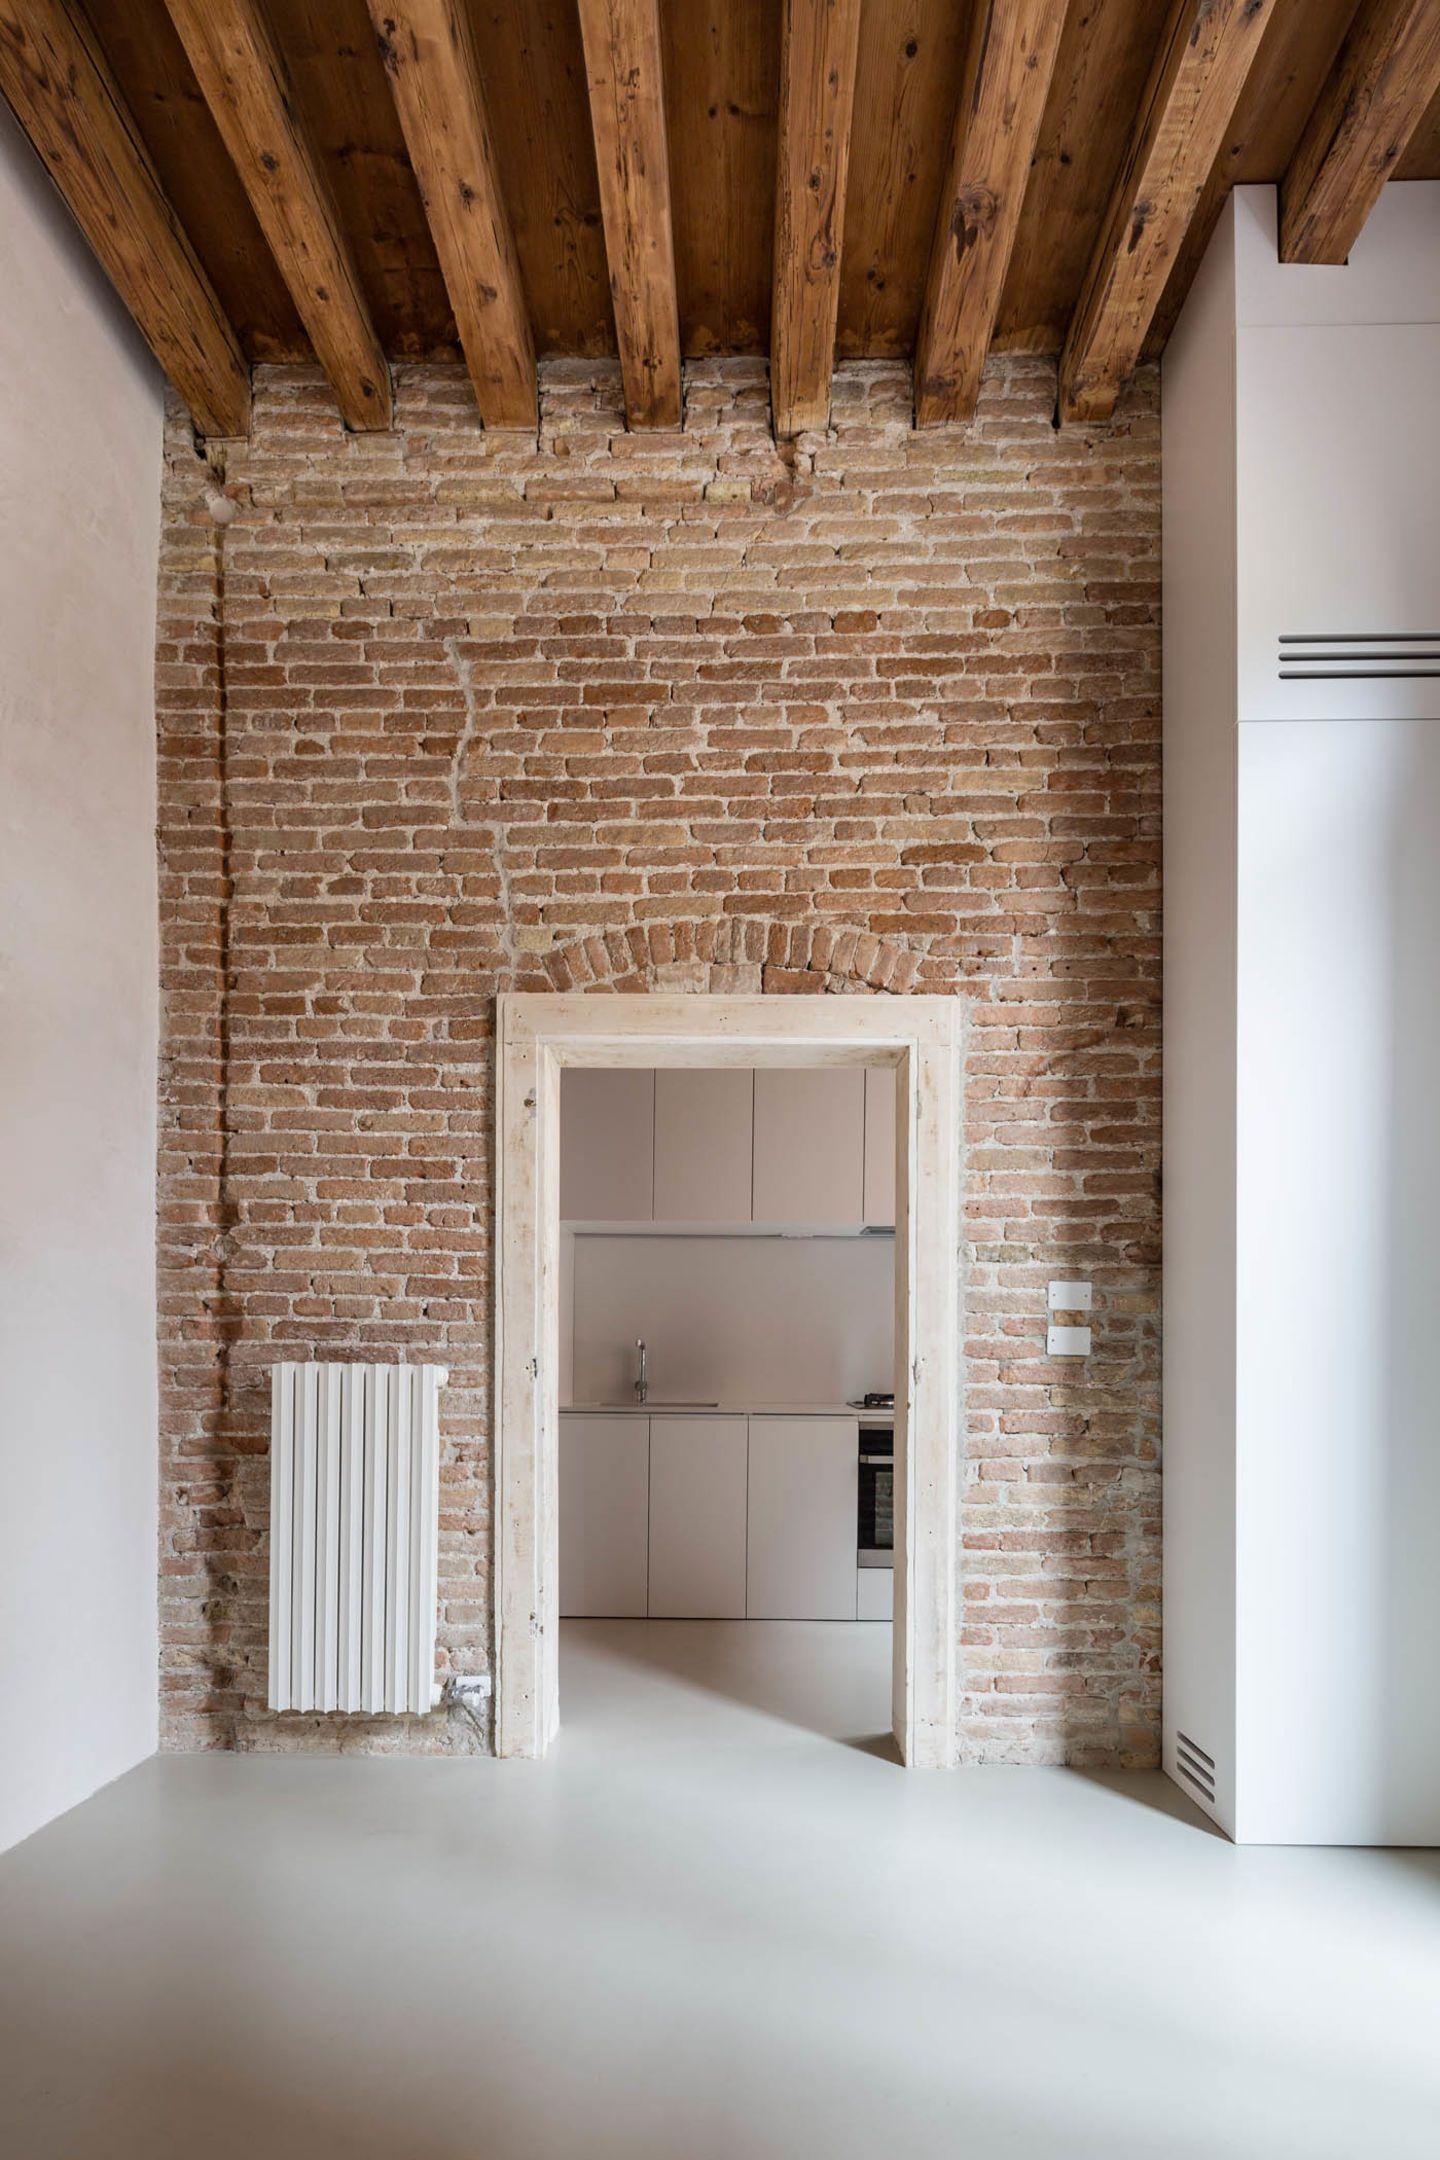 Ank interni casa ev architettura italiana interni for Architettura interni case